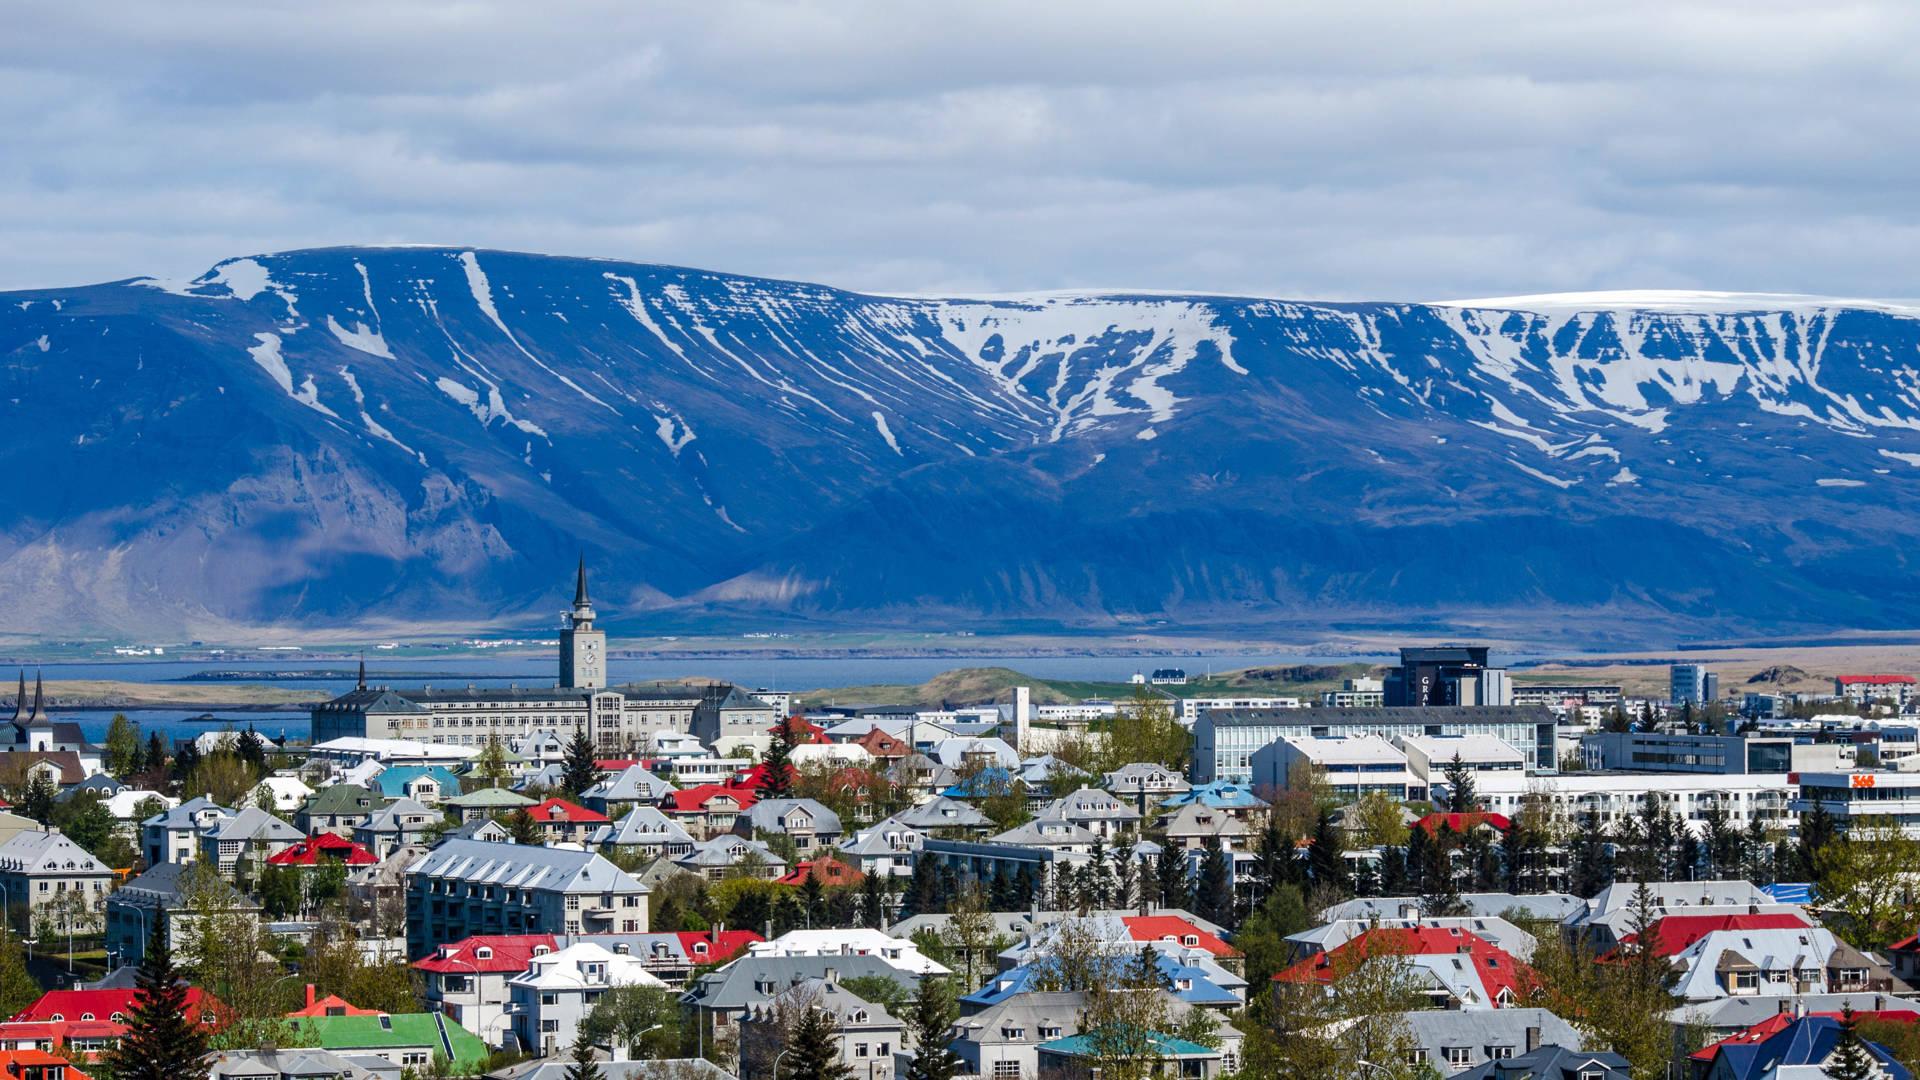 iceland reyjkavik church epic beautiful colorful